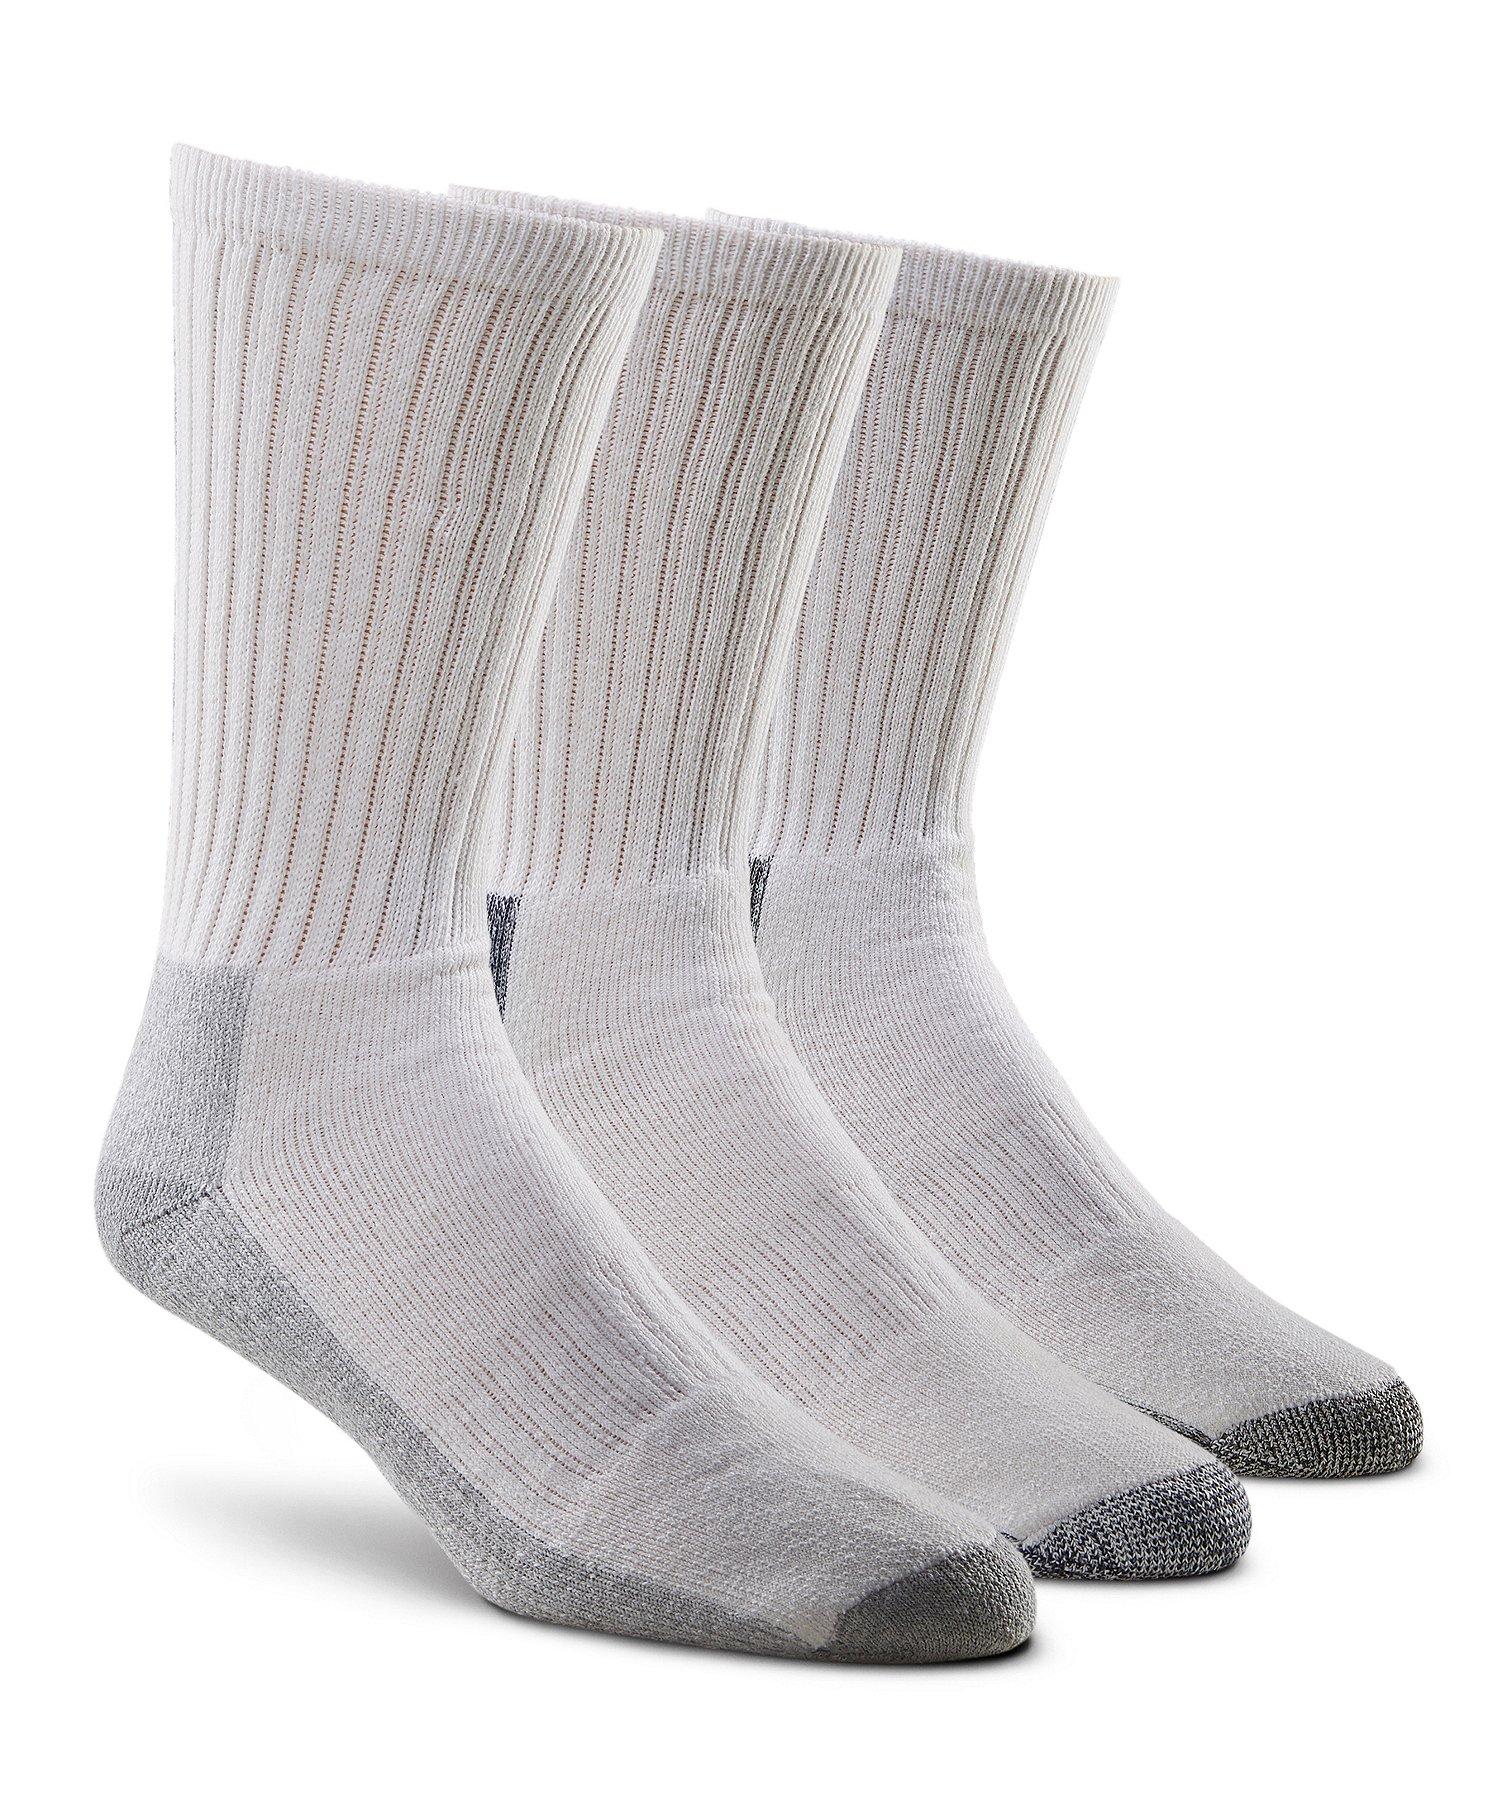 NEXT Mens BIG FOOT 5 Pack Cotton Socks Size 11.5-14